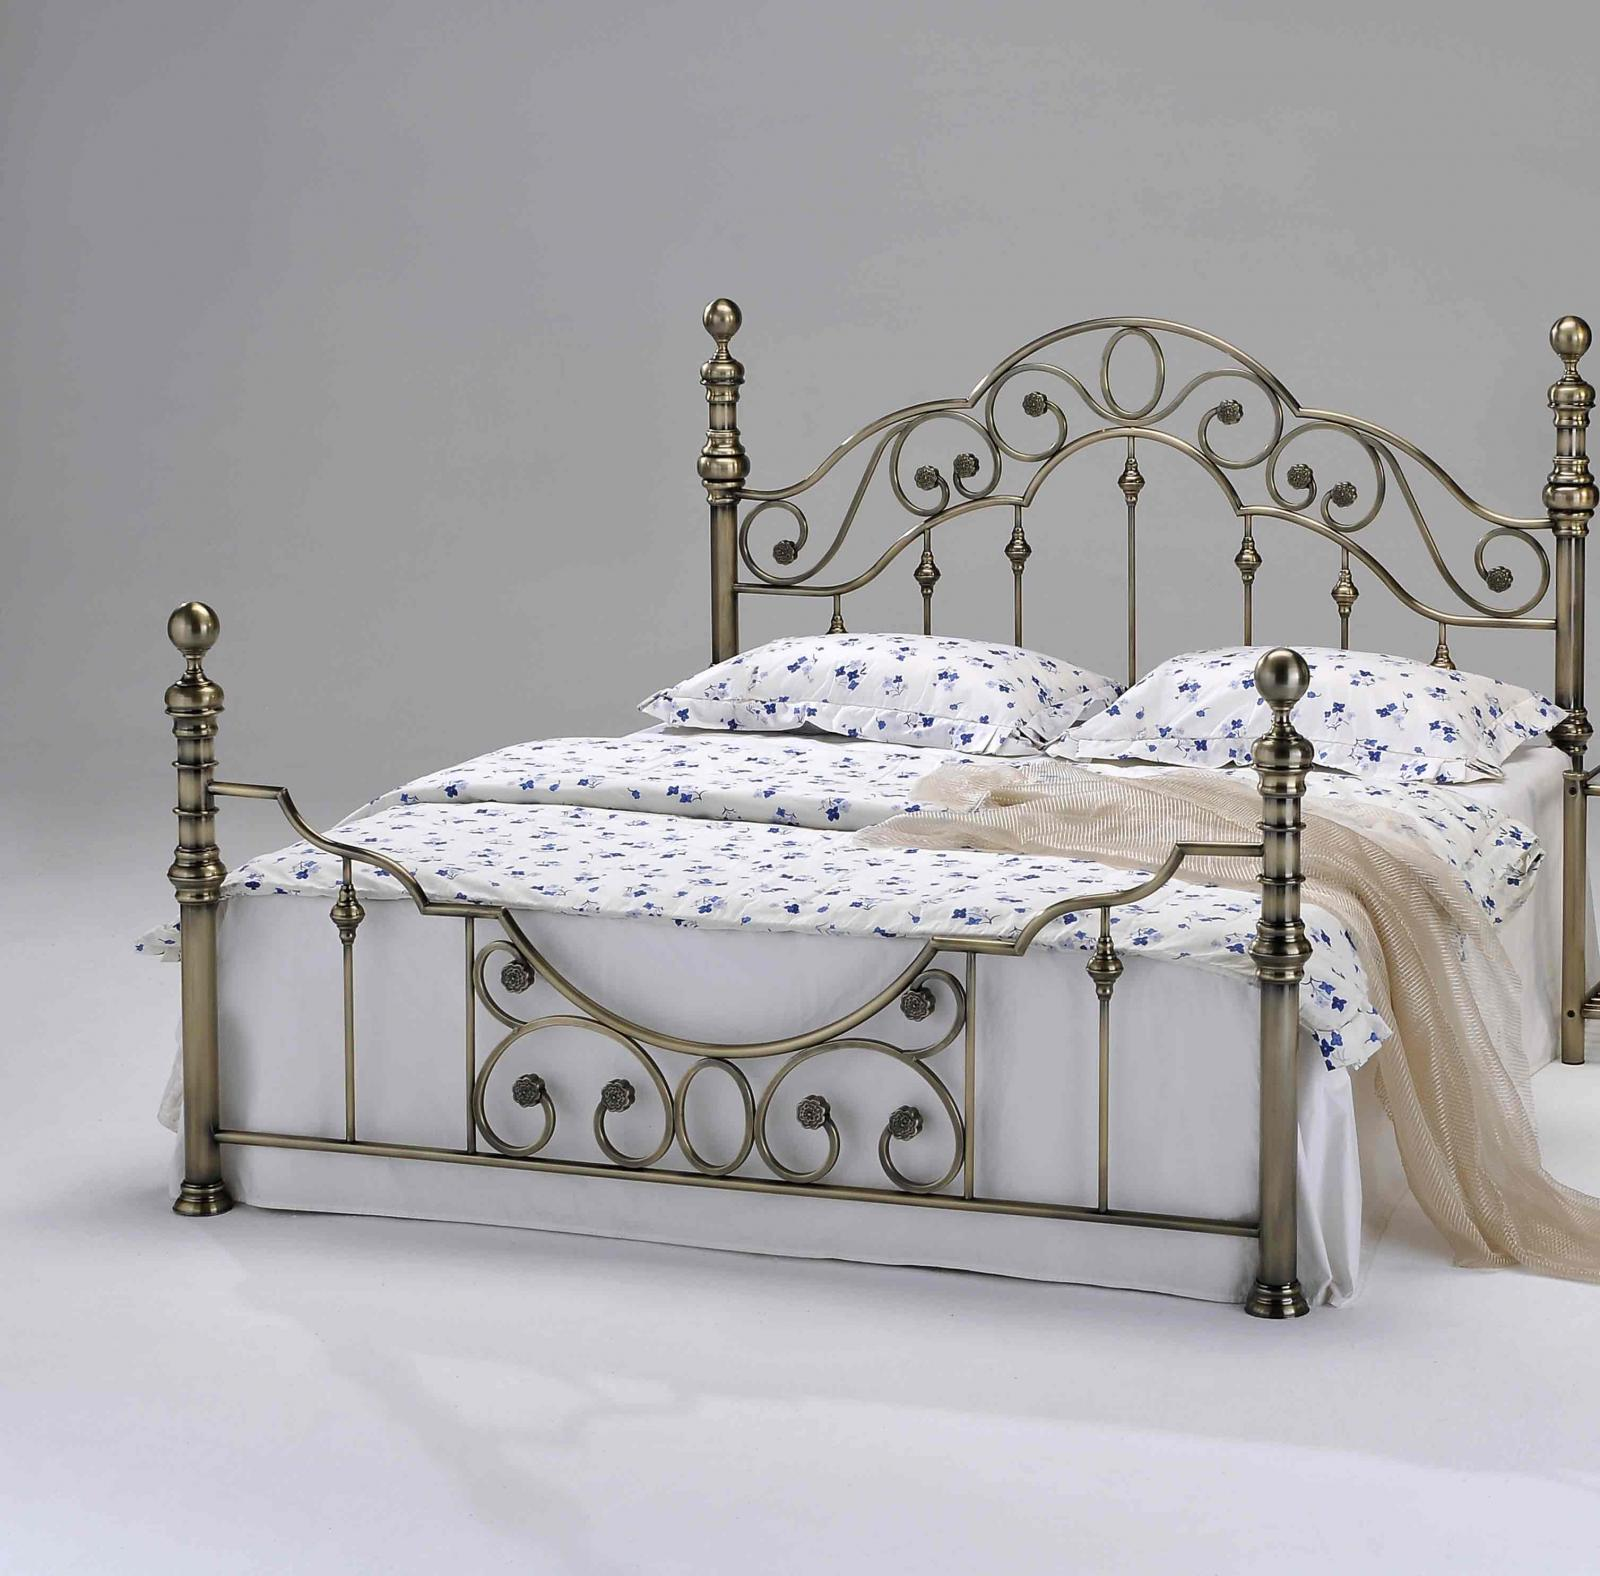 Image Result For Shabby Chic Bed Frame Uk